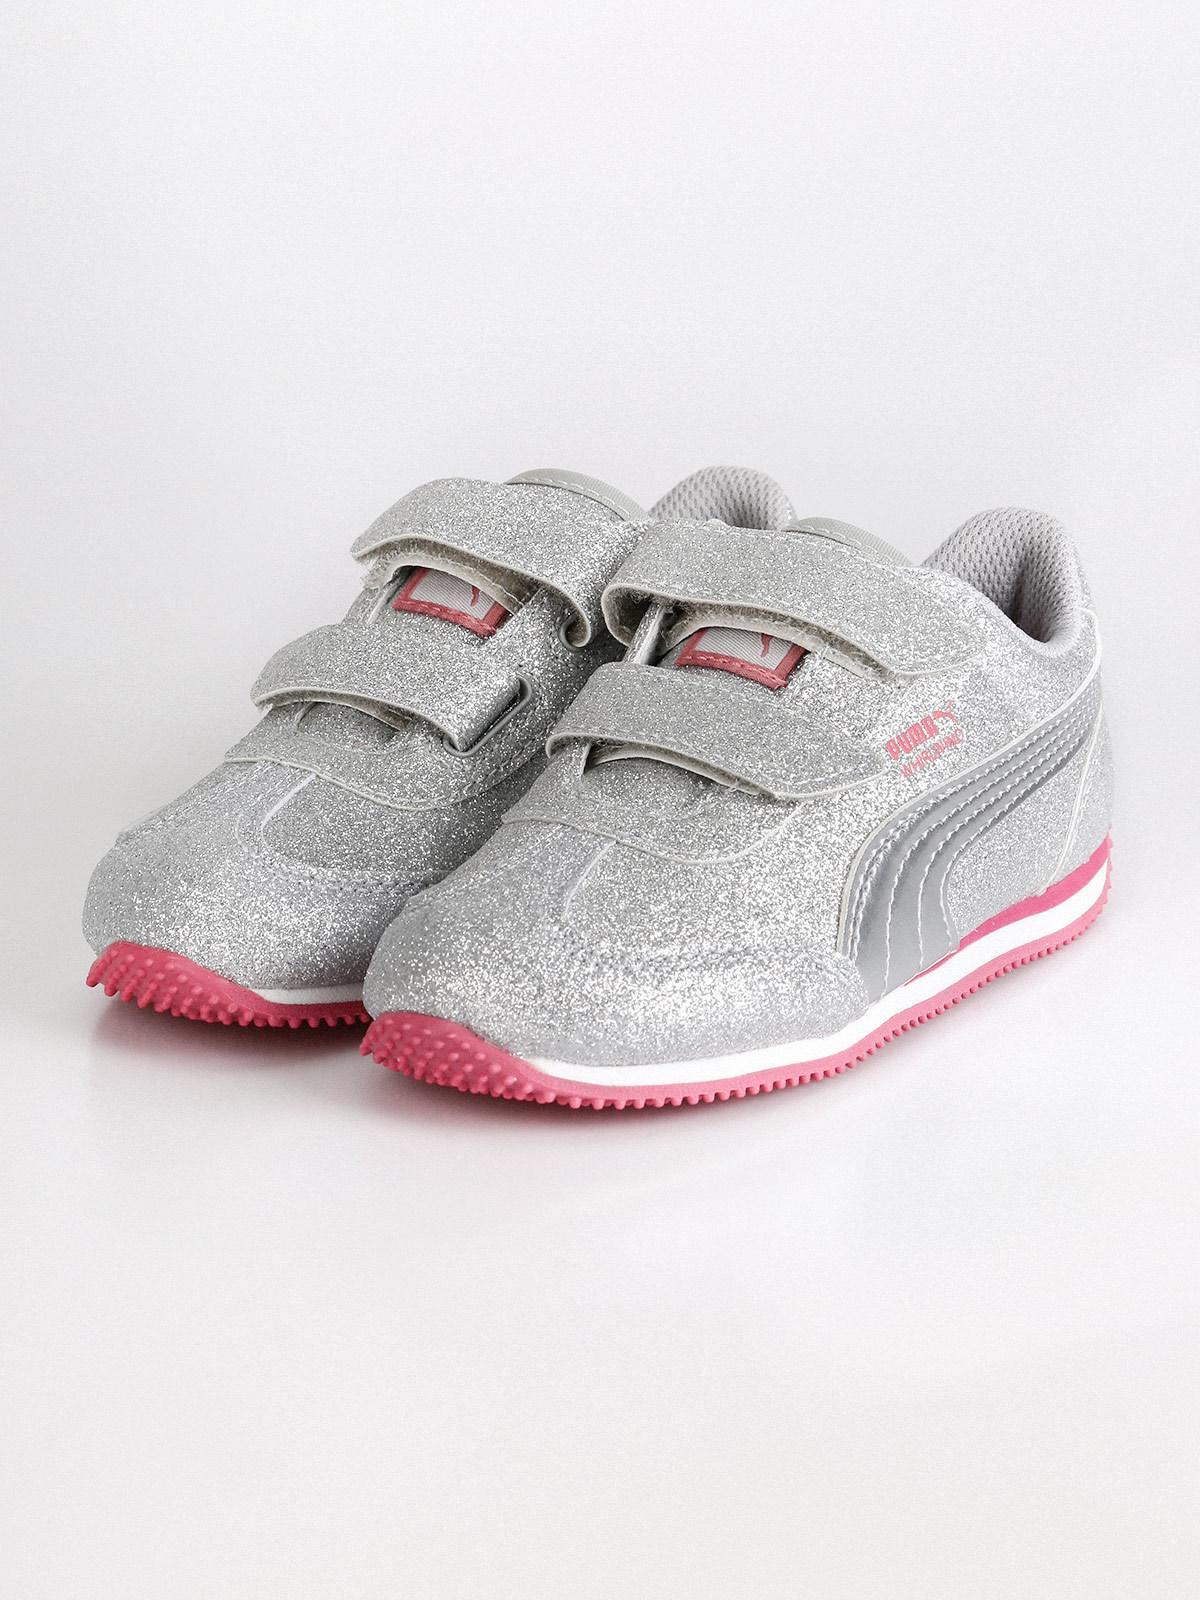 d71aa62820 Sneakers whirlwind glitz argento puma | MecShopping